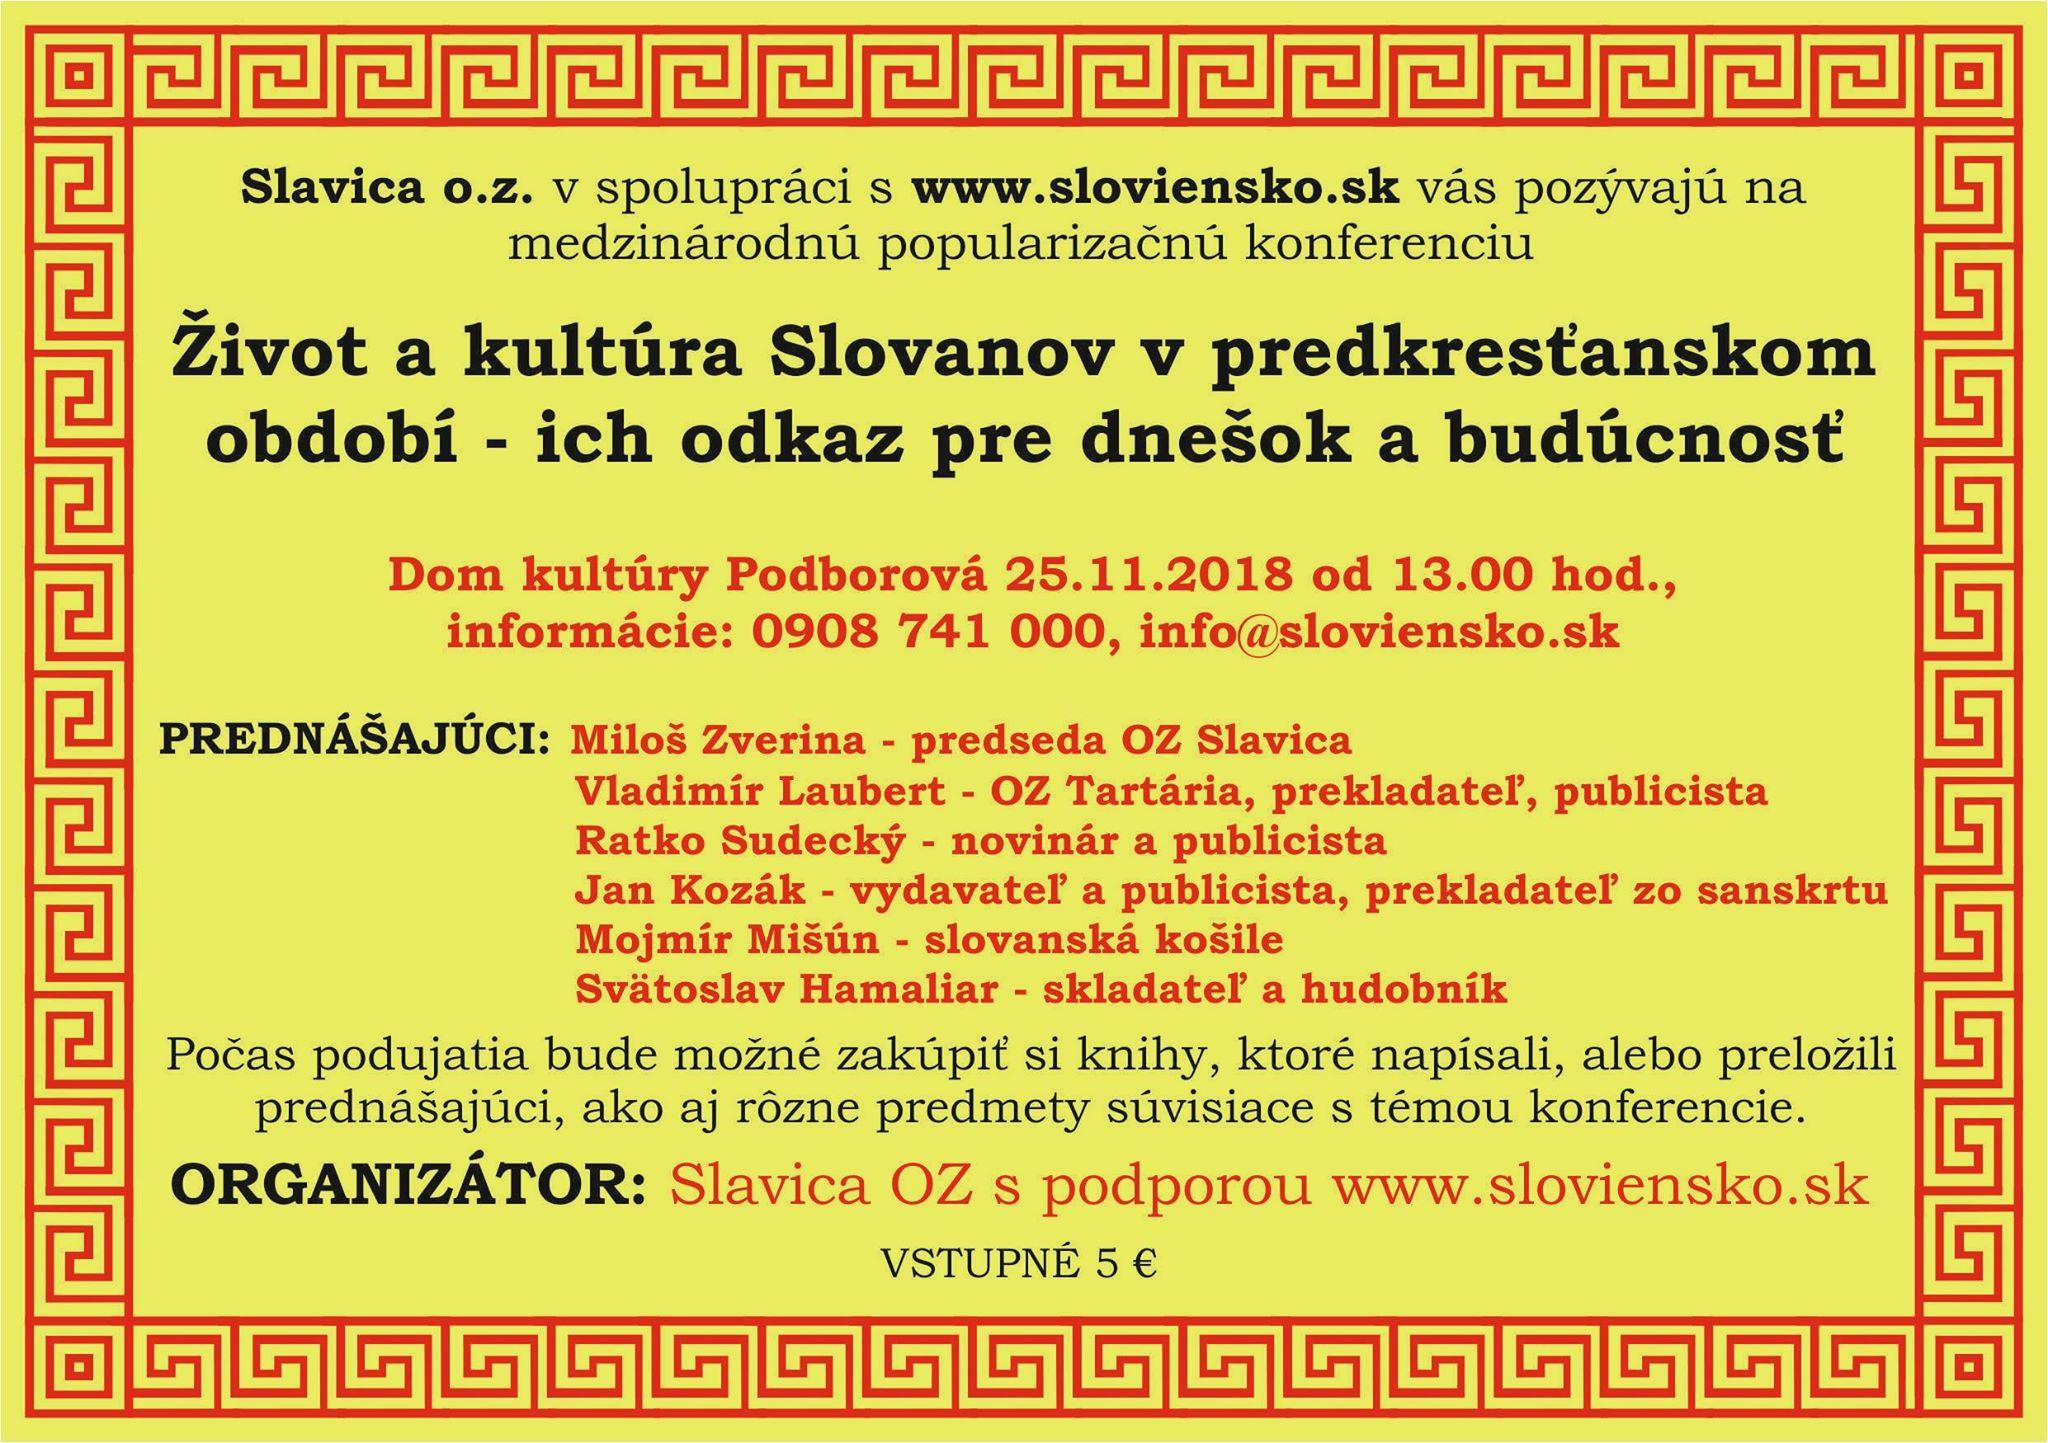 Zivot a kultura Slovanov (25.11.2018, Zvolen)